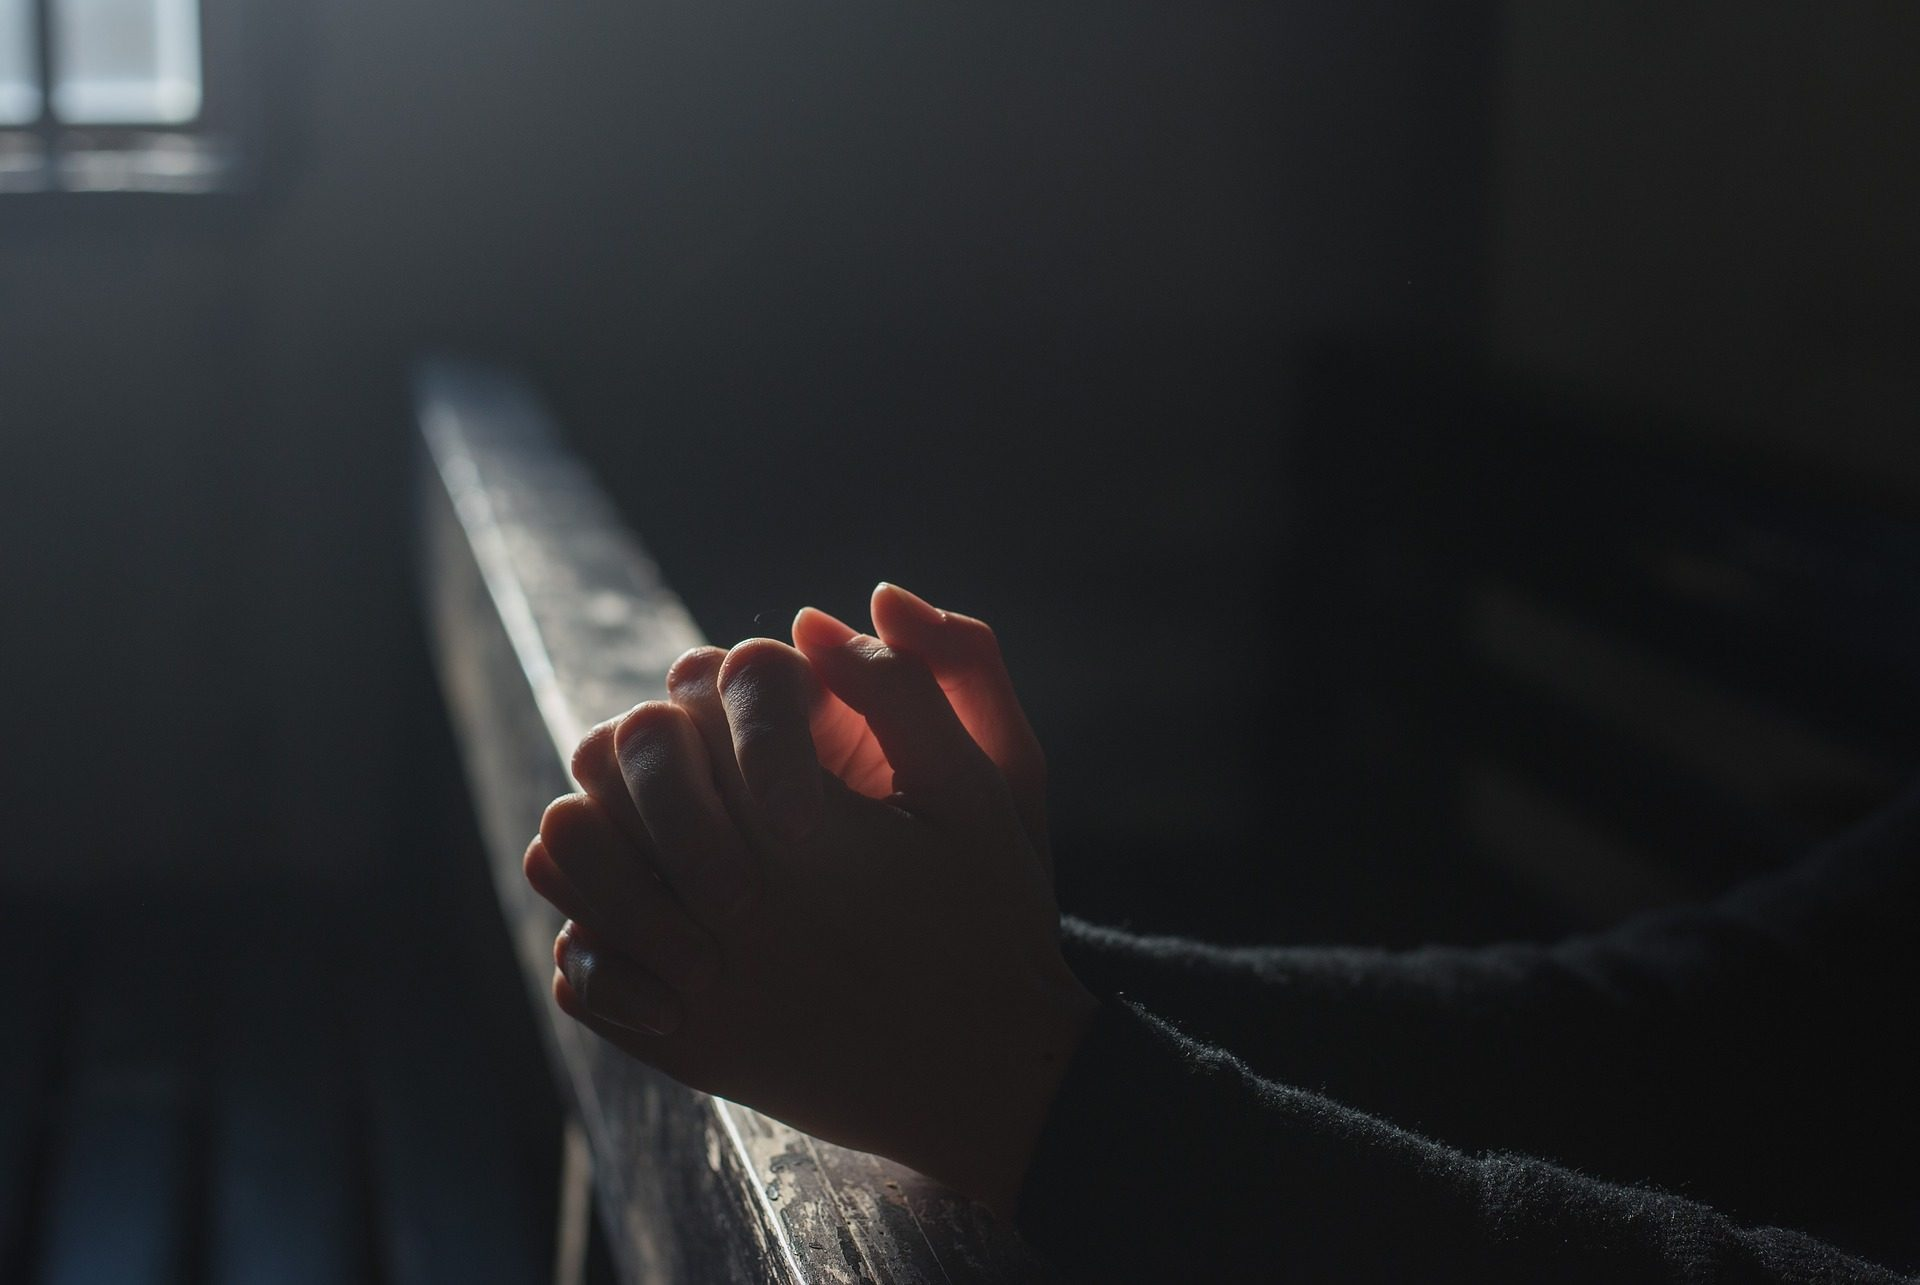 Oración, rezo, mani, Banca, ppreghiera- Sfondi HD - Professor-falken.com